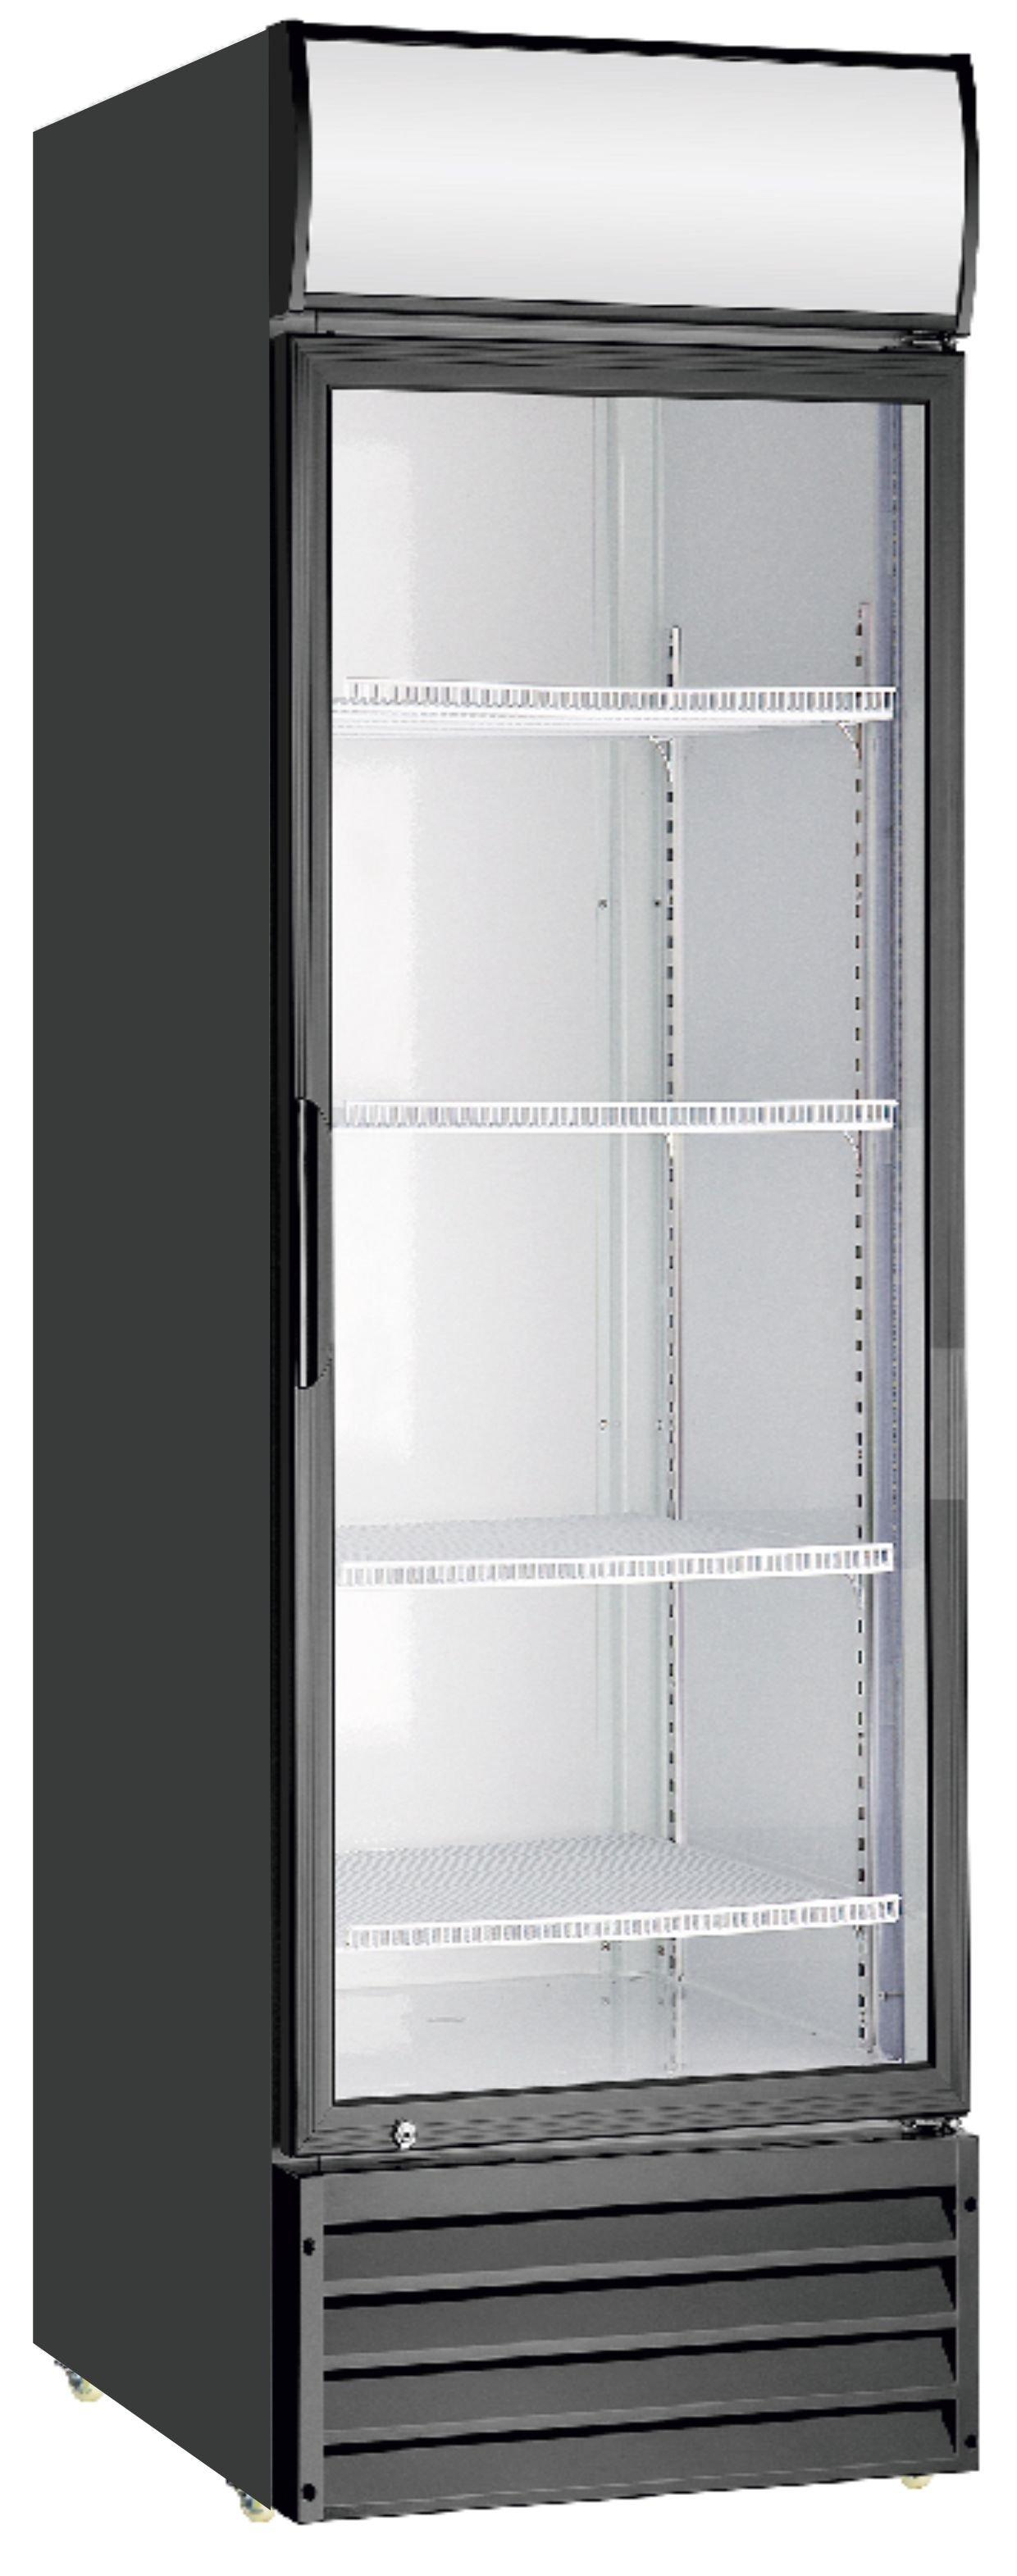 senox-ssc-600